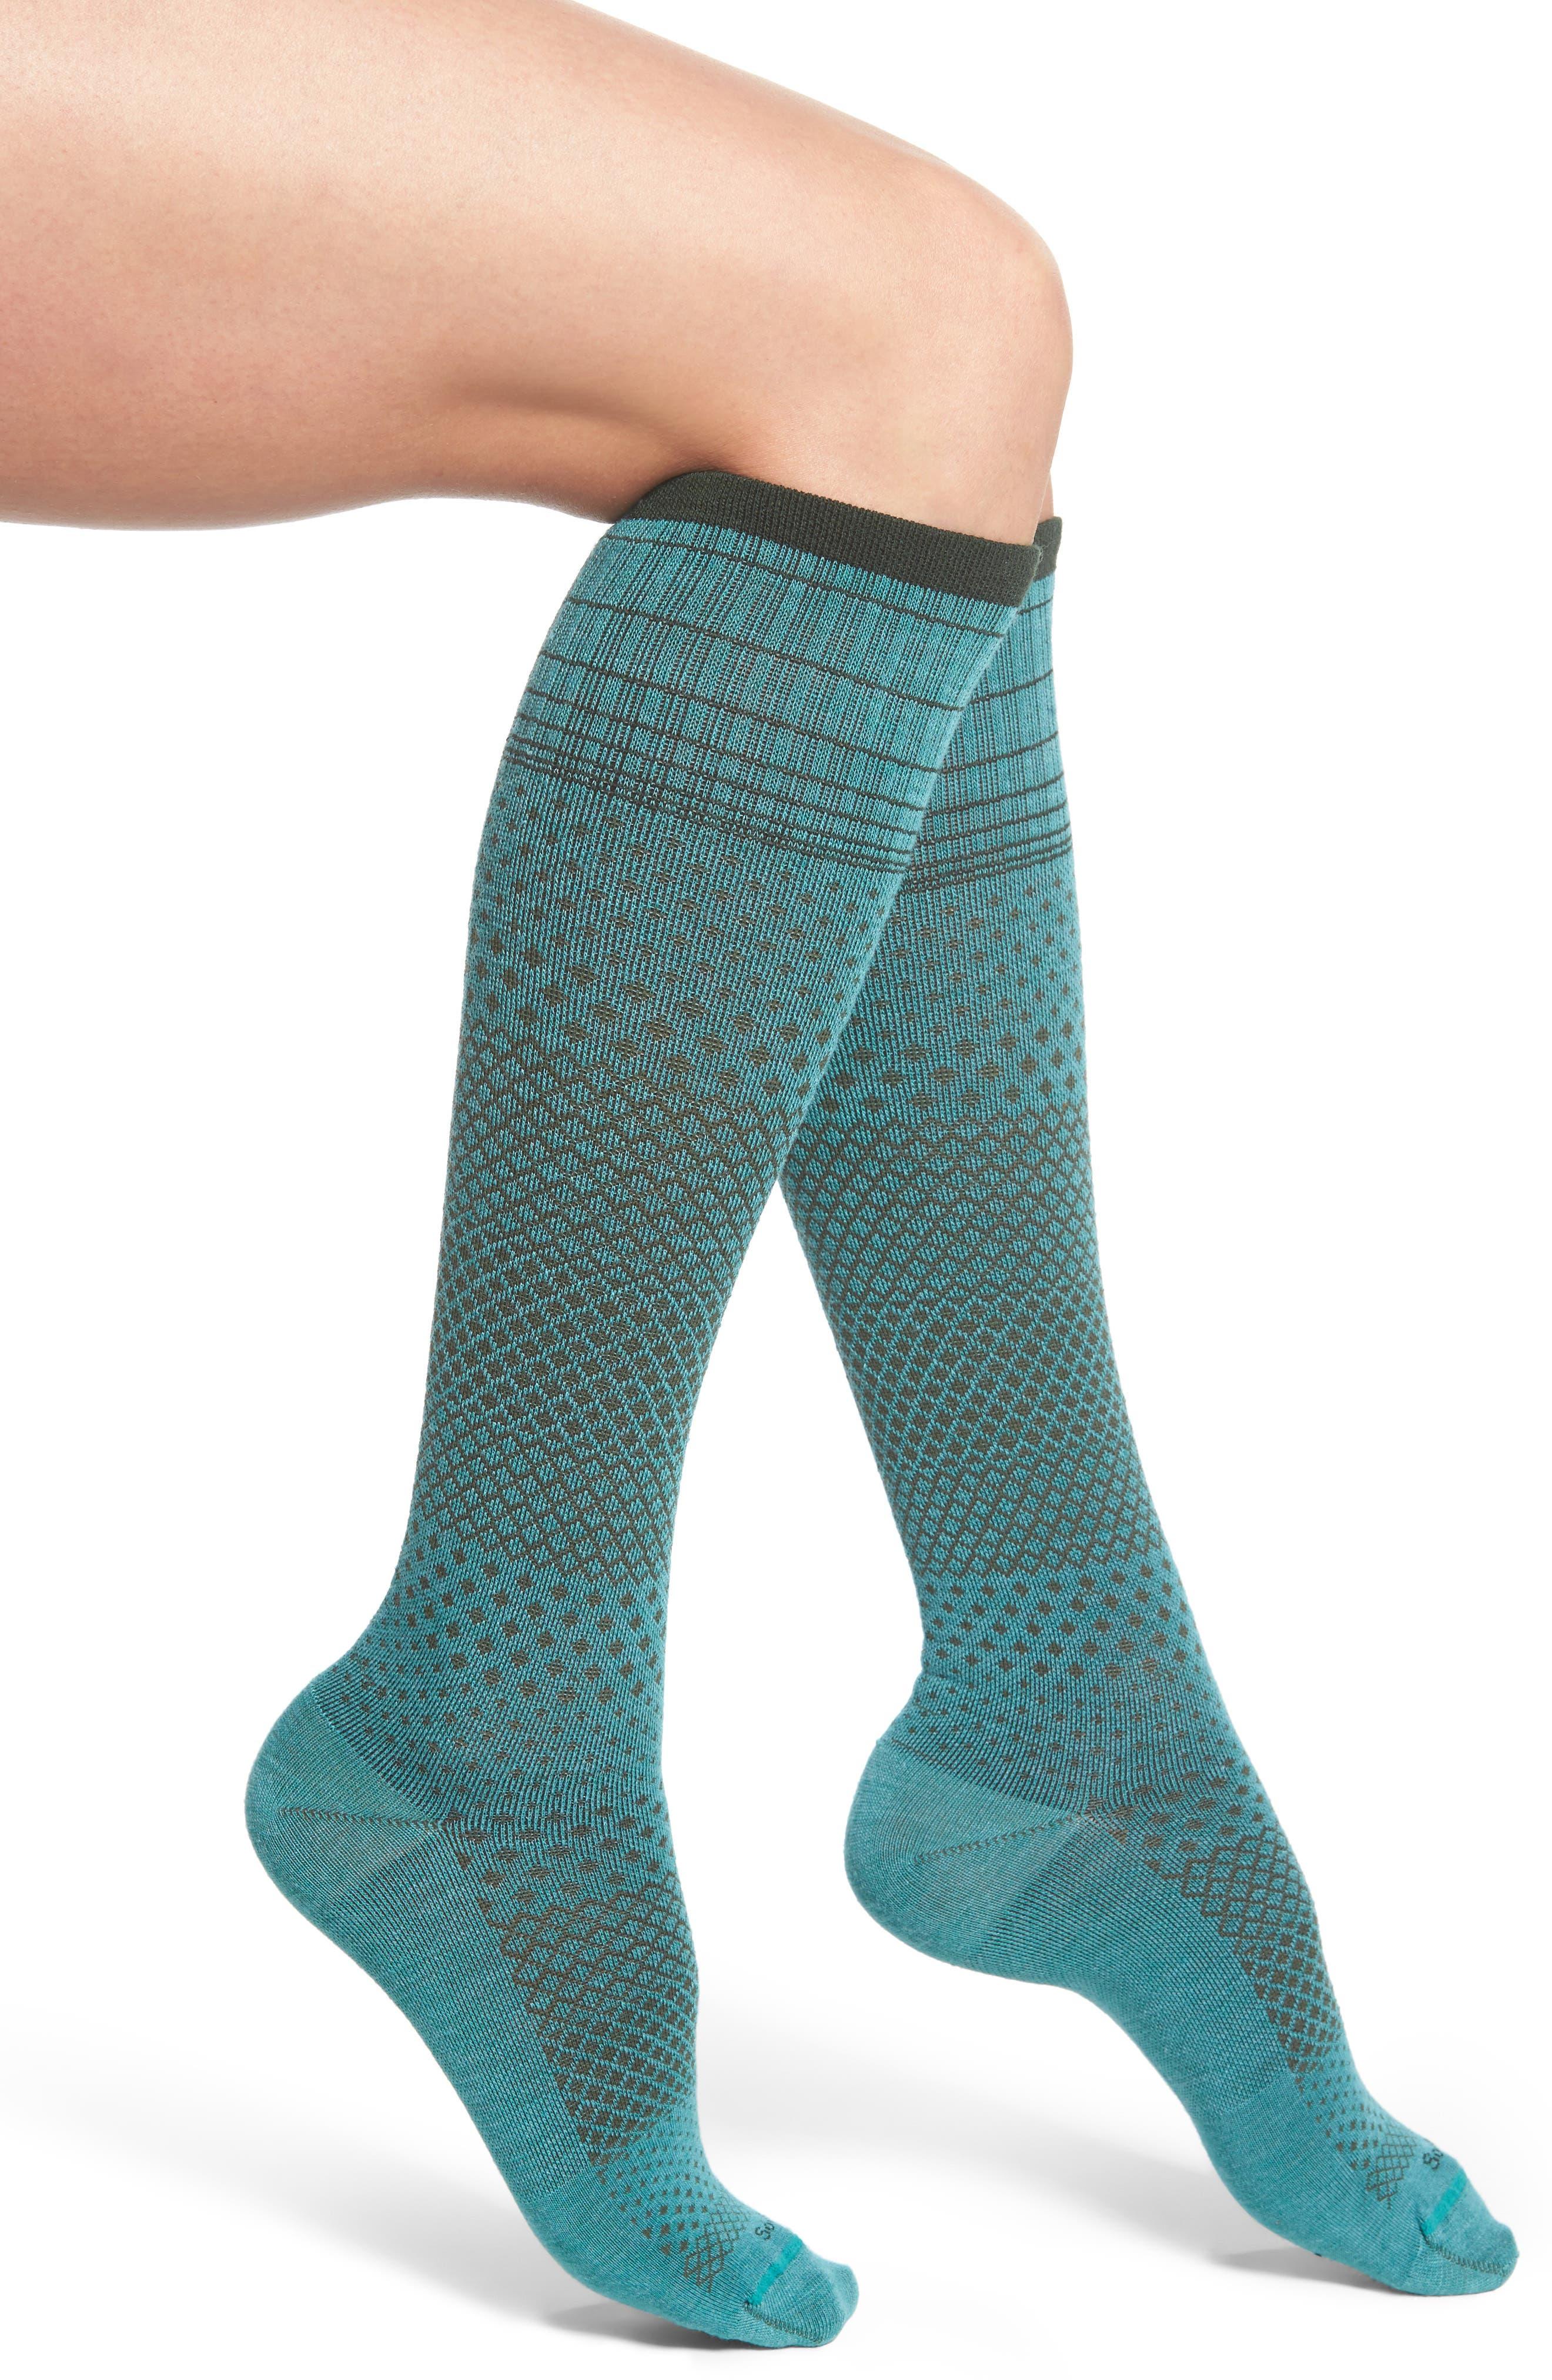 Alternate Image 1 Selected - Sockwell Micro Grade Compression Knee Socks